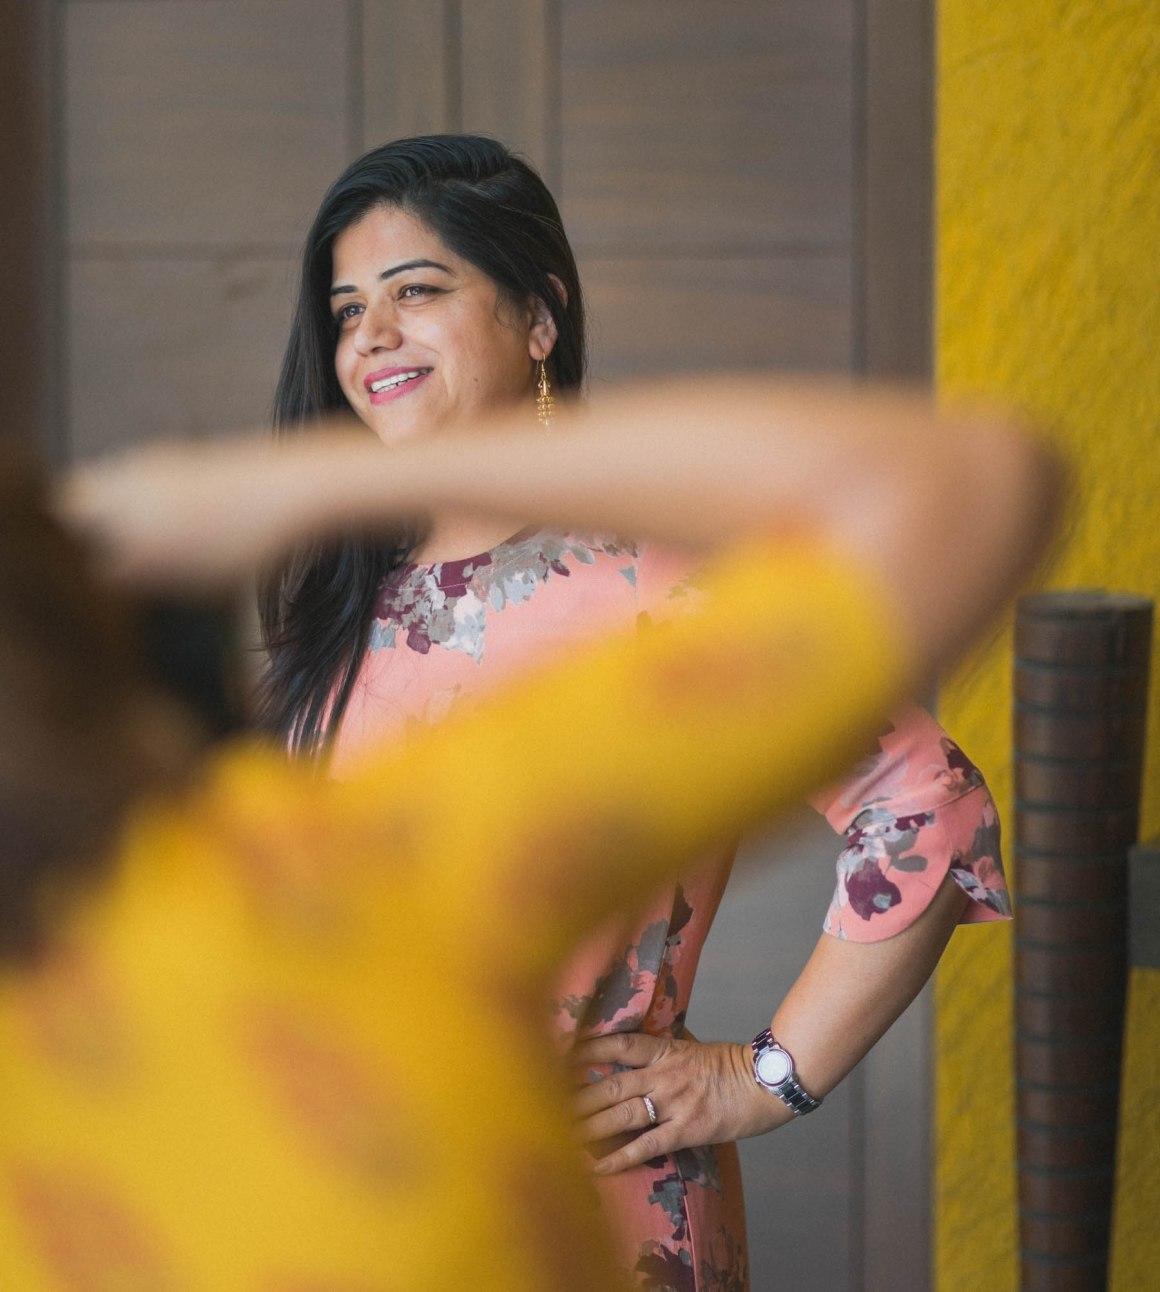 Naina Redhu, Naina, Naina.co, Family, Photographs, Saket, New Delhi, Lunch, Get Together, Young Photographer, Summers, India, Lifestyle Photographer India, Luxury Photographer India, Professional Photographer India, Lifestyle Blogger India, Luxury Blogger India, Professional Blogger India, Lifestyle Influencer India, Luxury Influencer India, Professional Influencer India, Experience Collector, Visual Storyteller